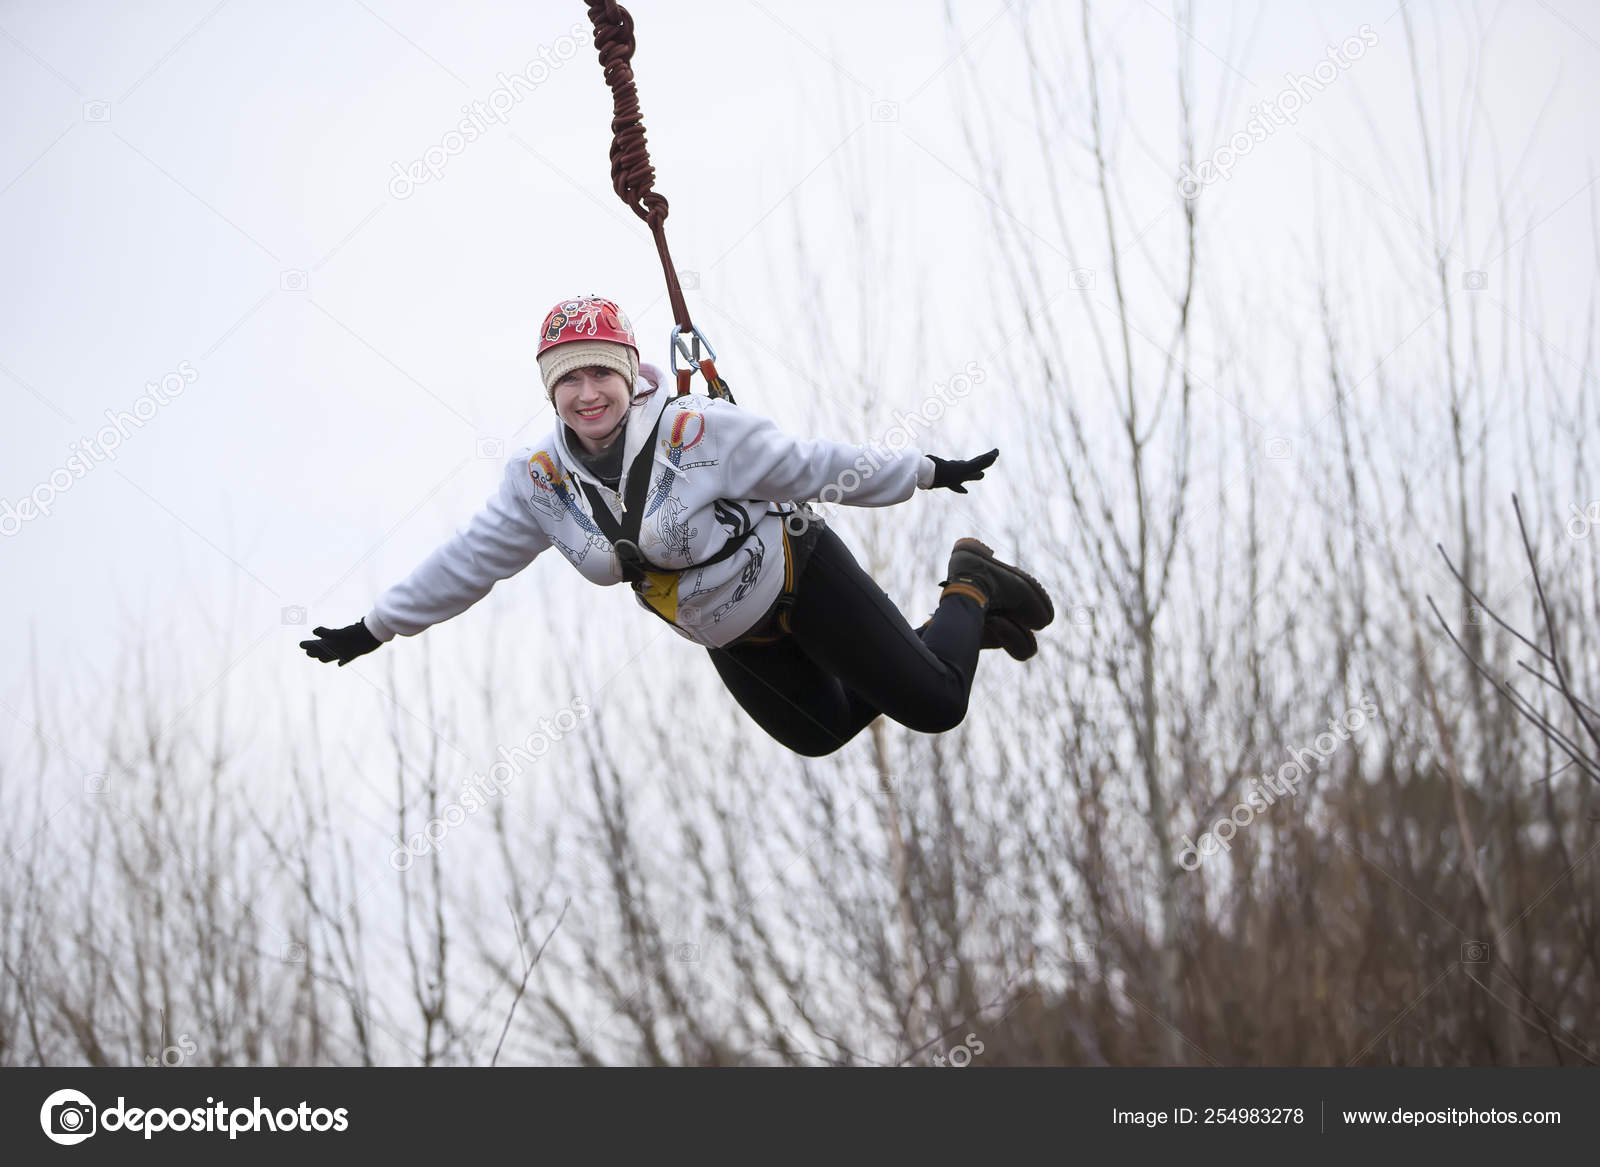 Belarus Gomel March 2019 Jumping Bridge Rope Ropejumping